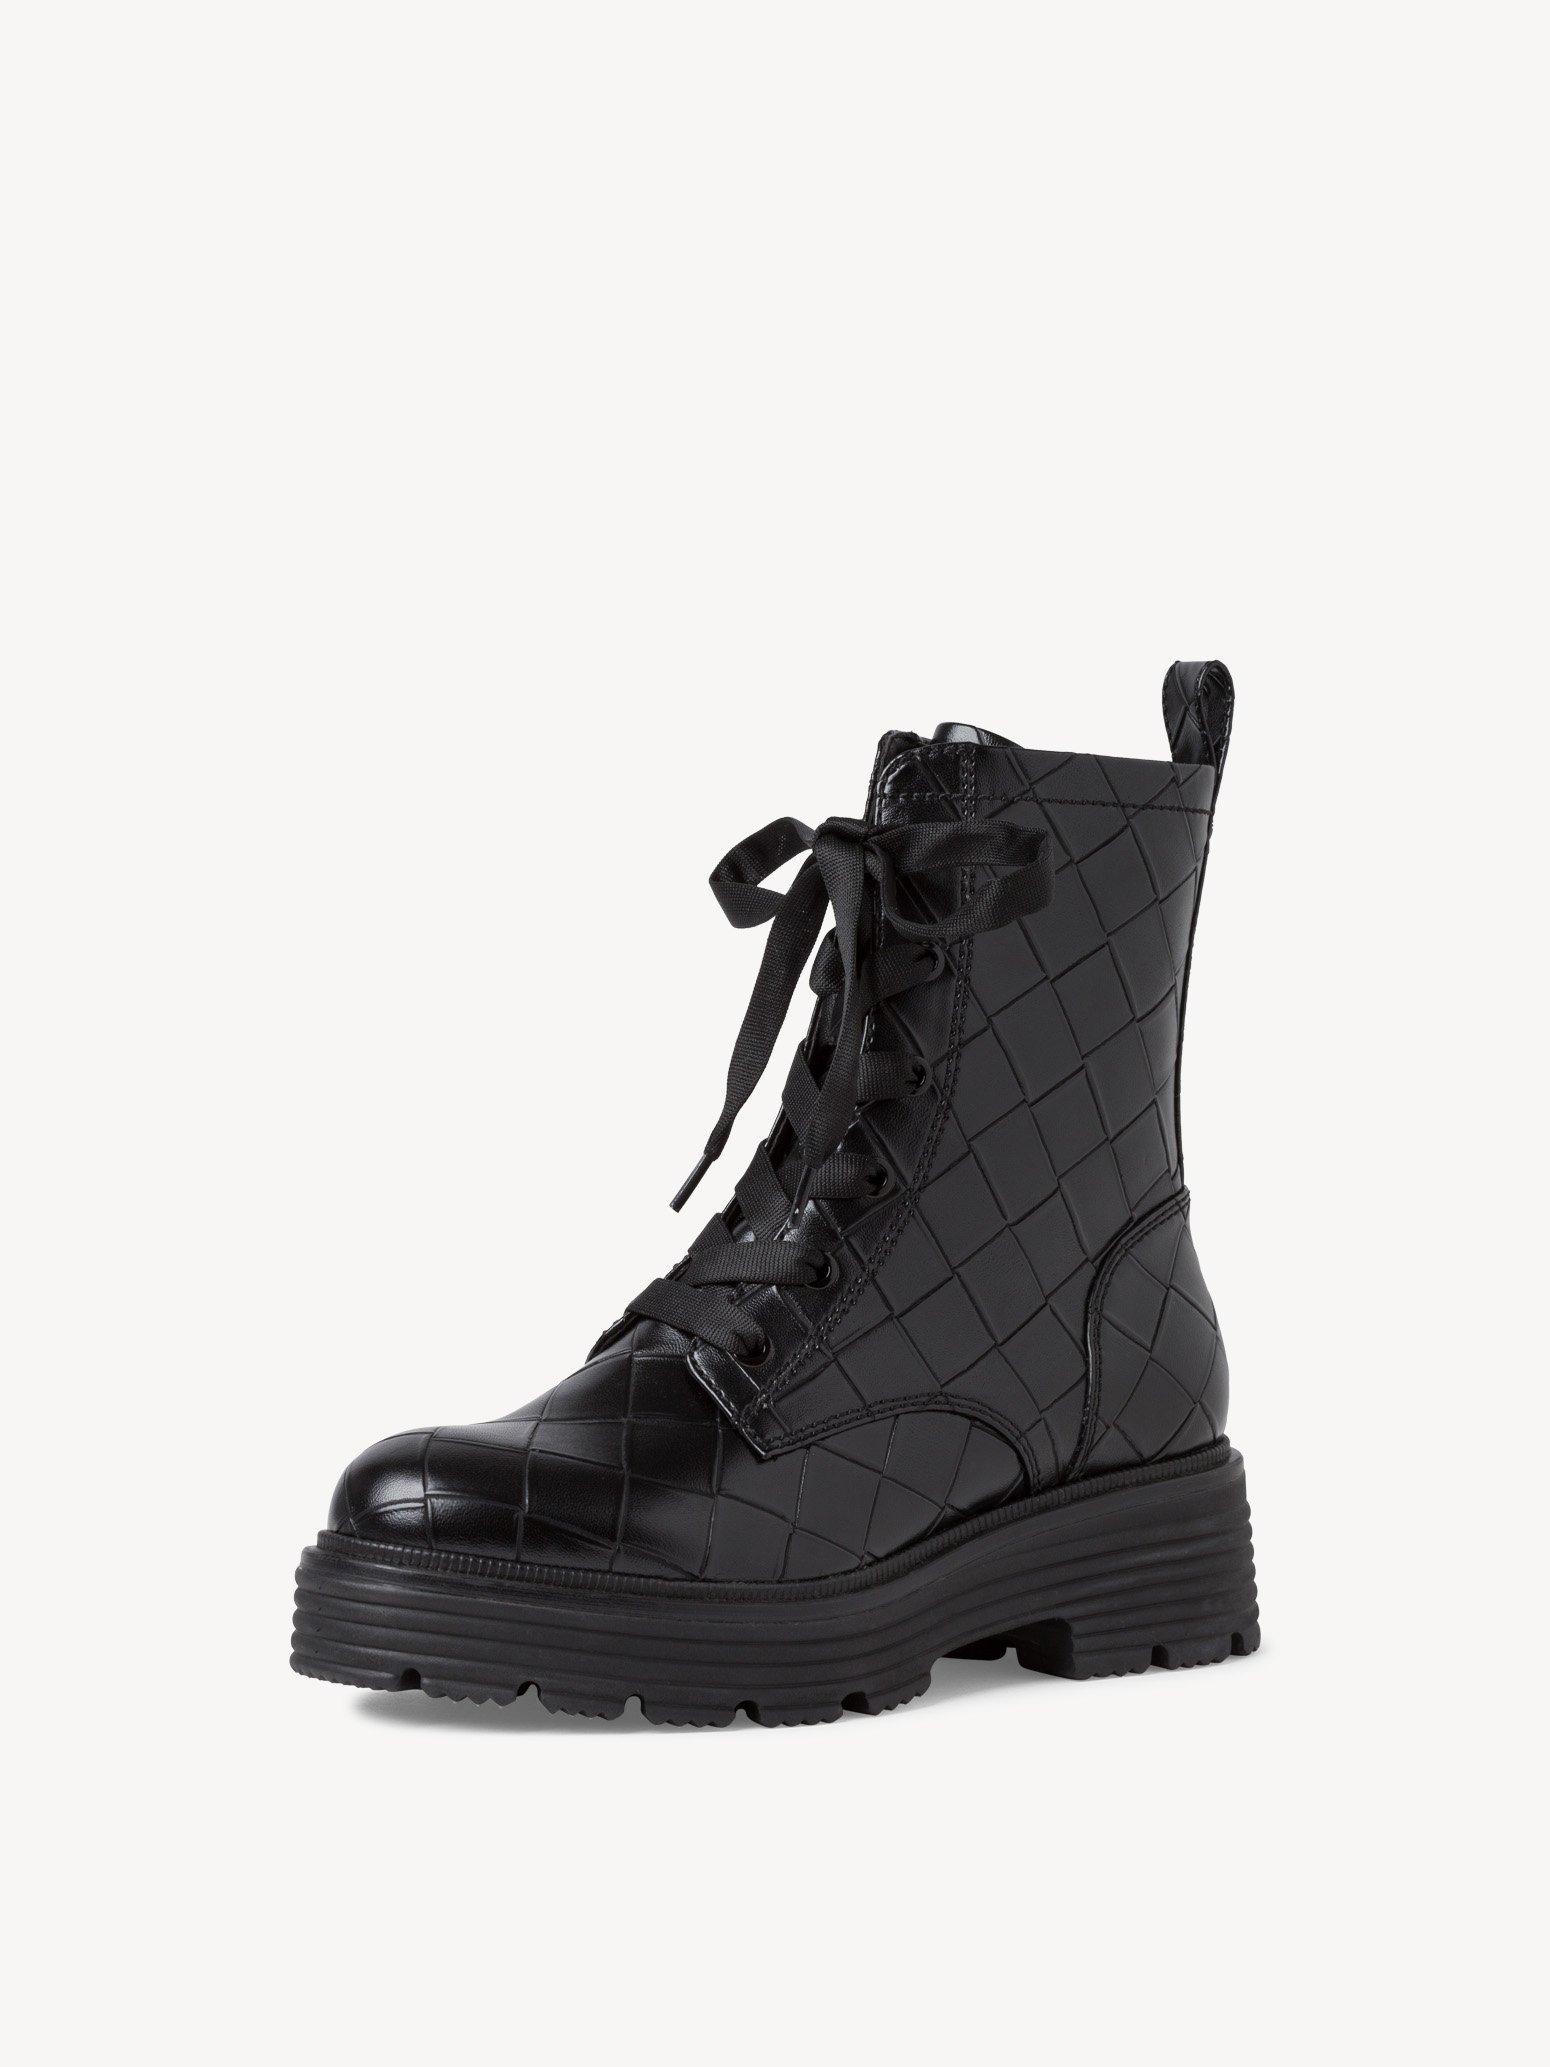 Ботинки Tamaris 1-1-25226-27-006